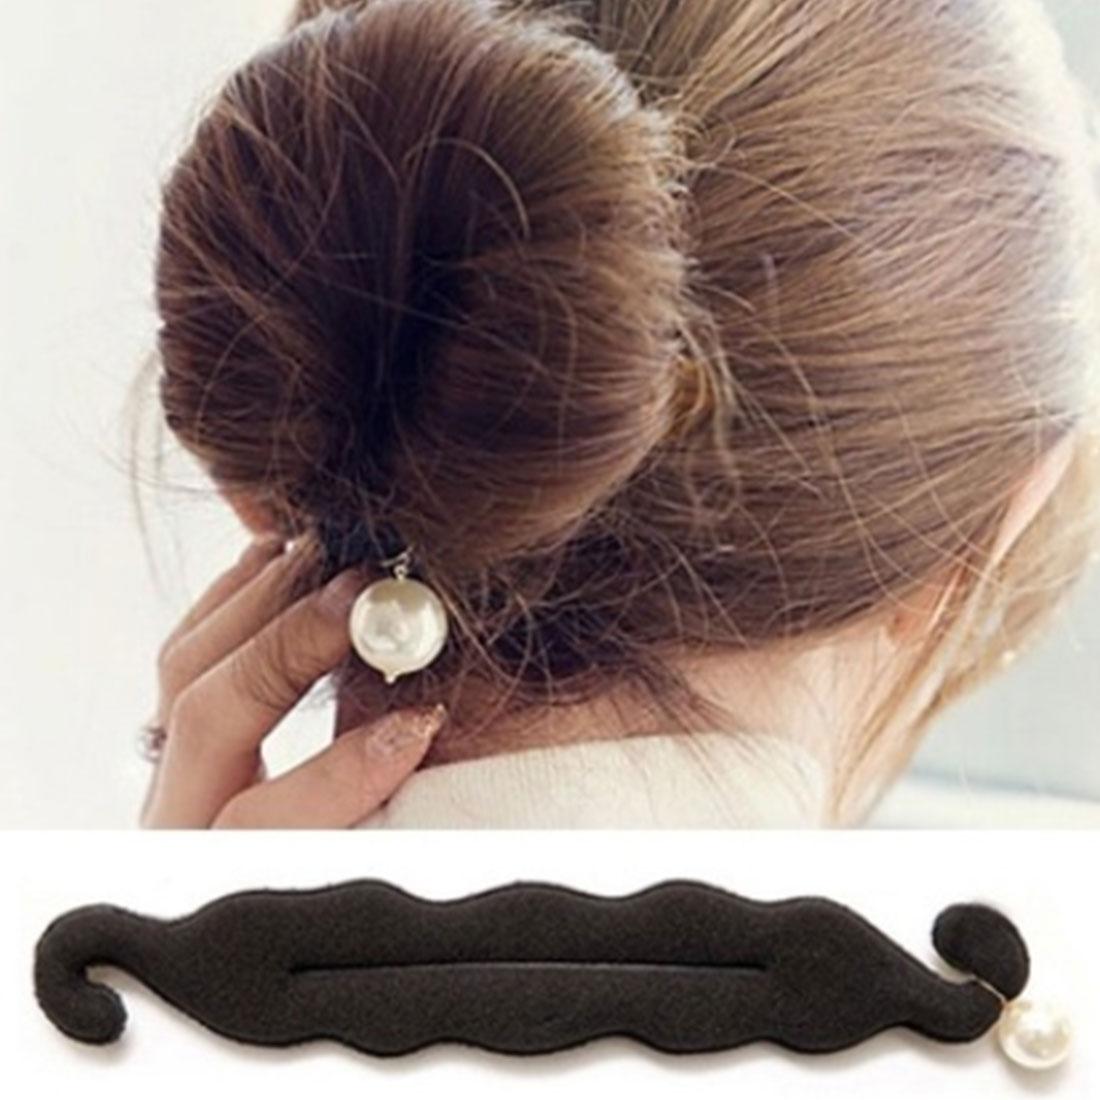 Pearl Sponge Hair Styles Maker Tress Tool Hair Ornaments Hair Accessories Women Magic Foam Sponge DIY Bun Roller For Headwear